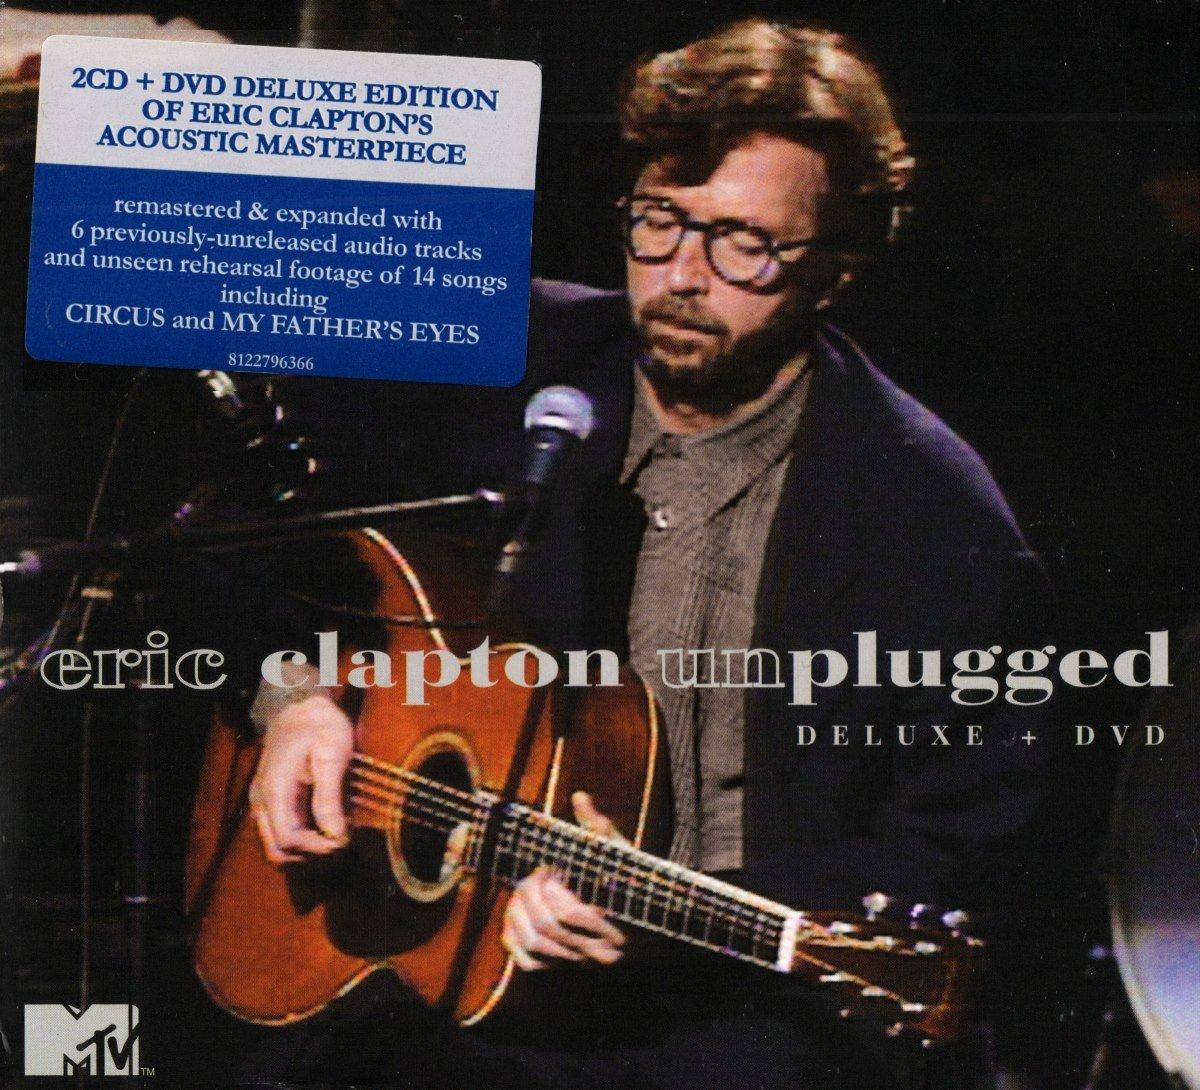 Eric Clapton 187 Lossless Galaxy лучшая музыка в формате